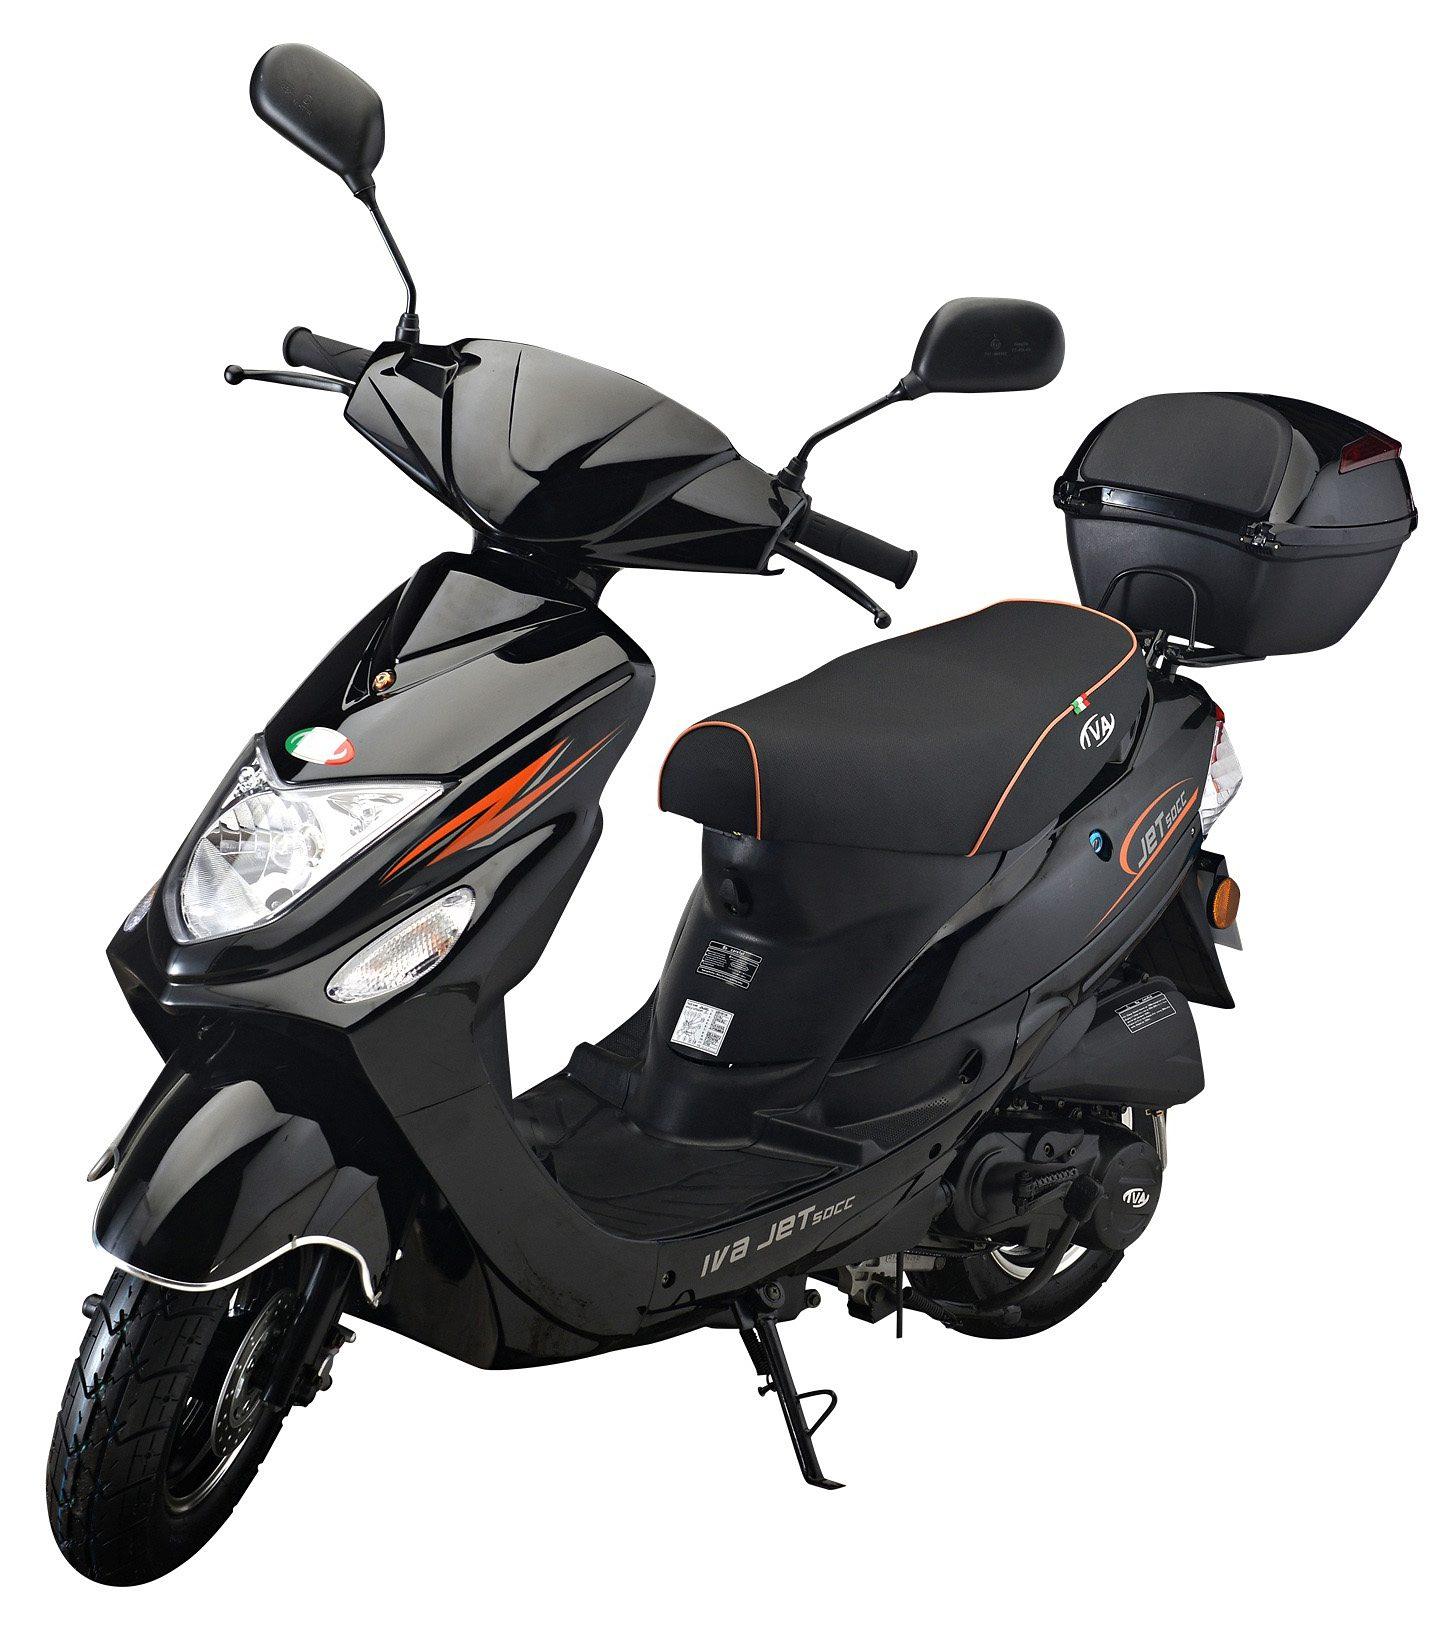 IVA Motorroller inkl. Topcase, 49 ccm, 45 km/h, schwarz, »Jet New«